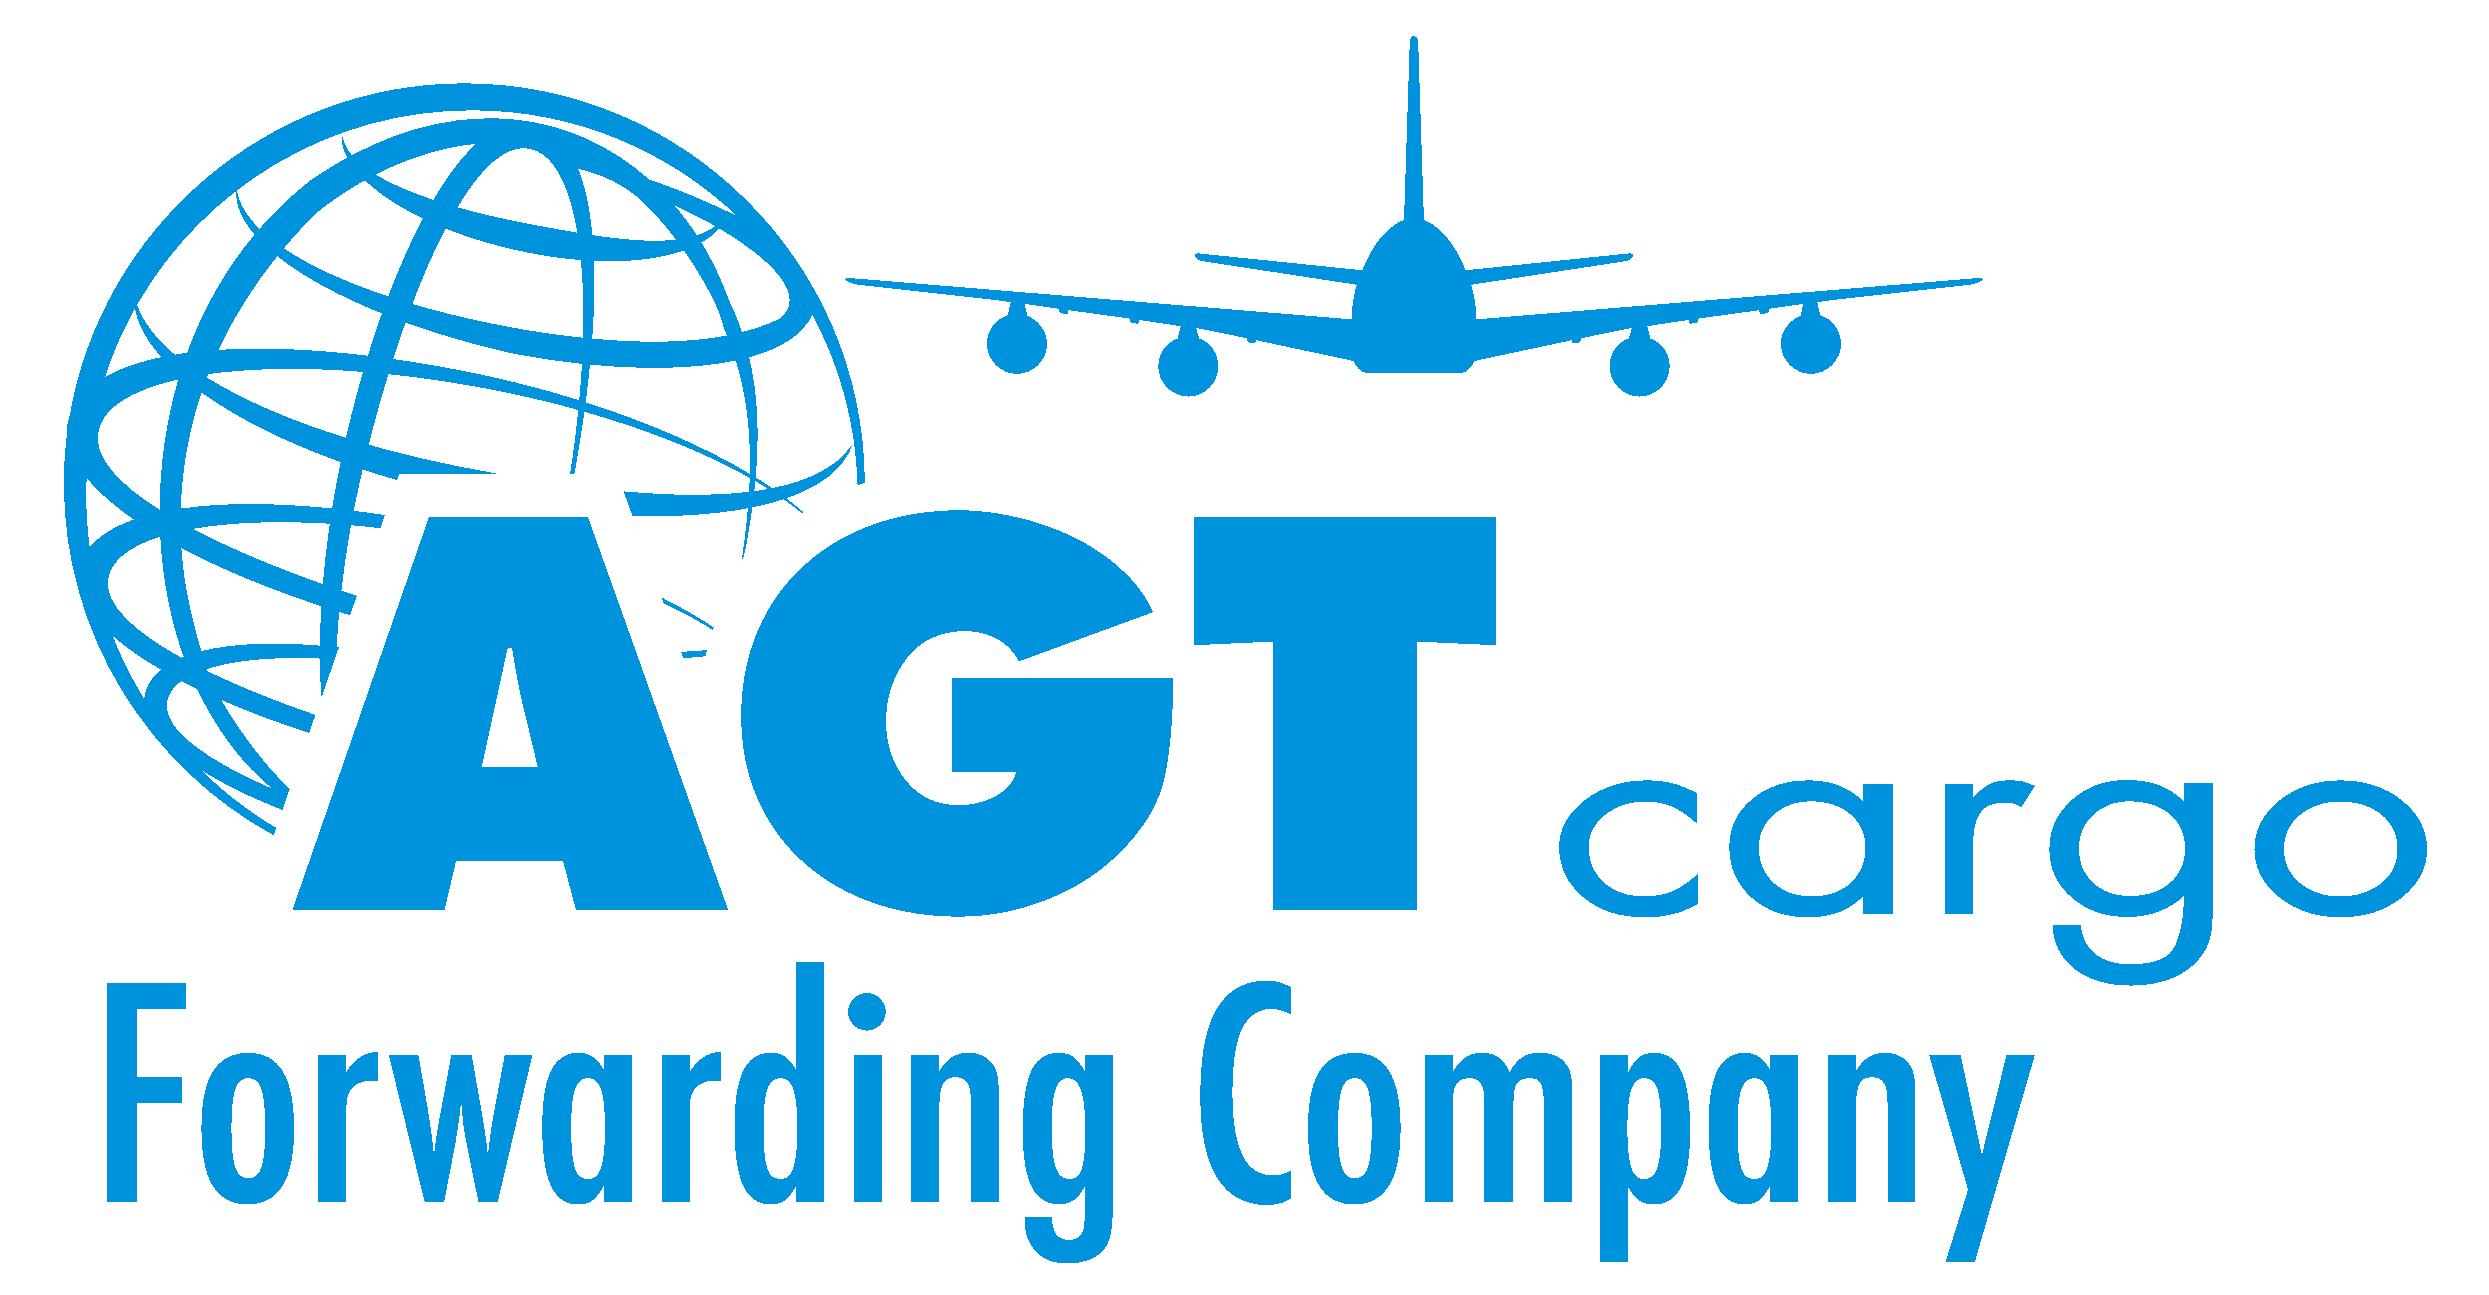 AG TRANS CARGO